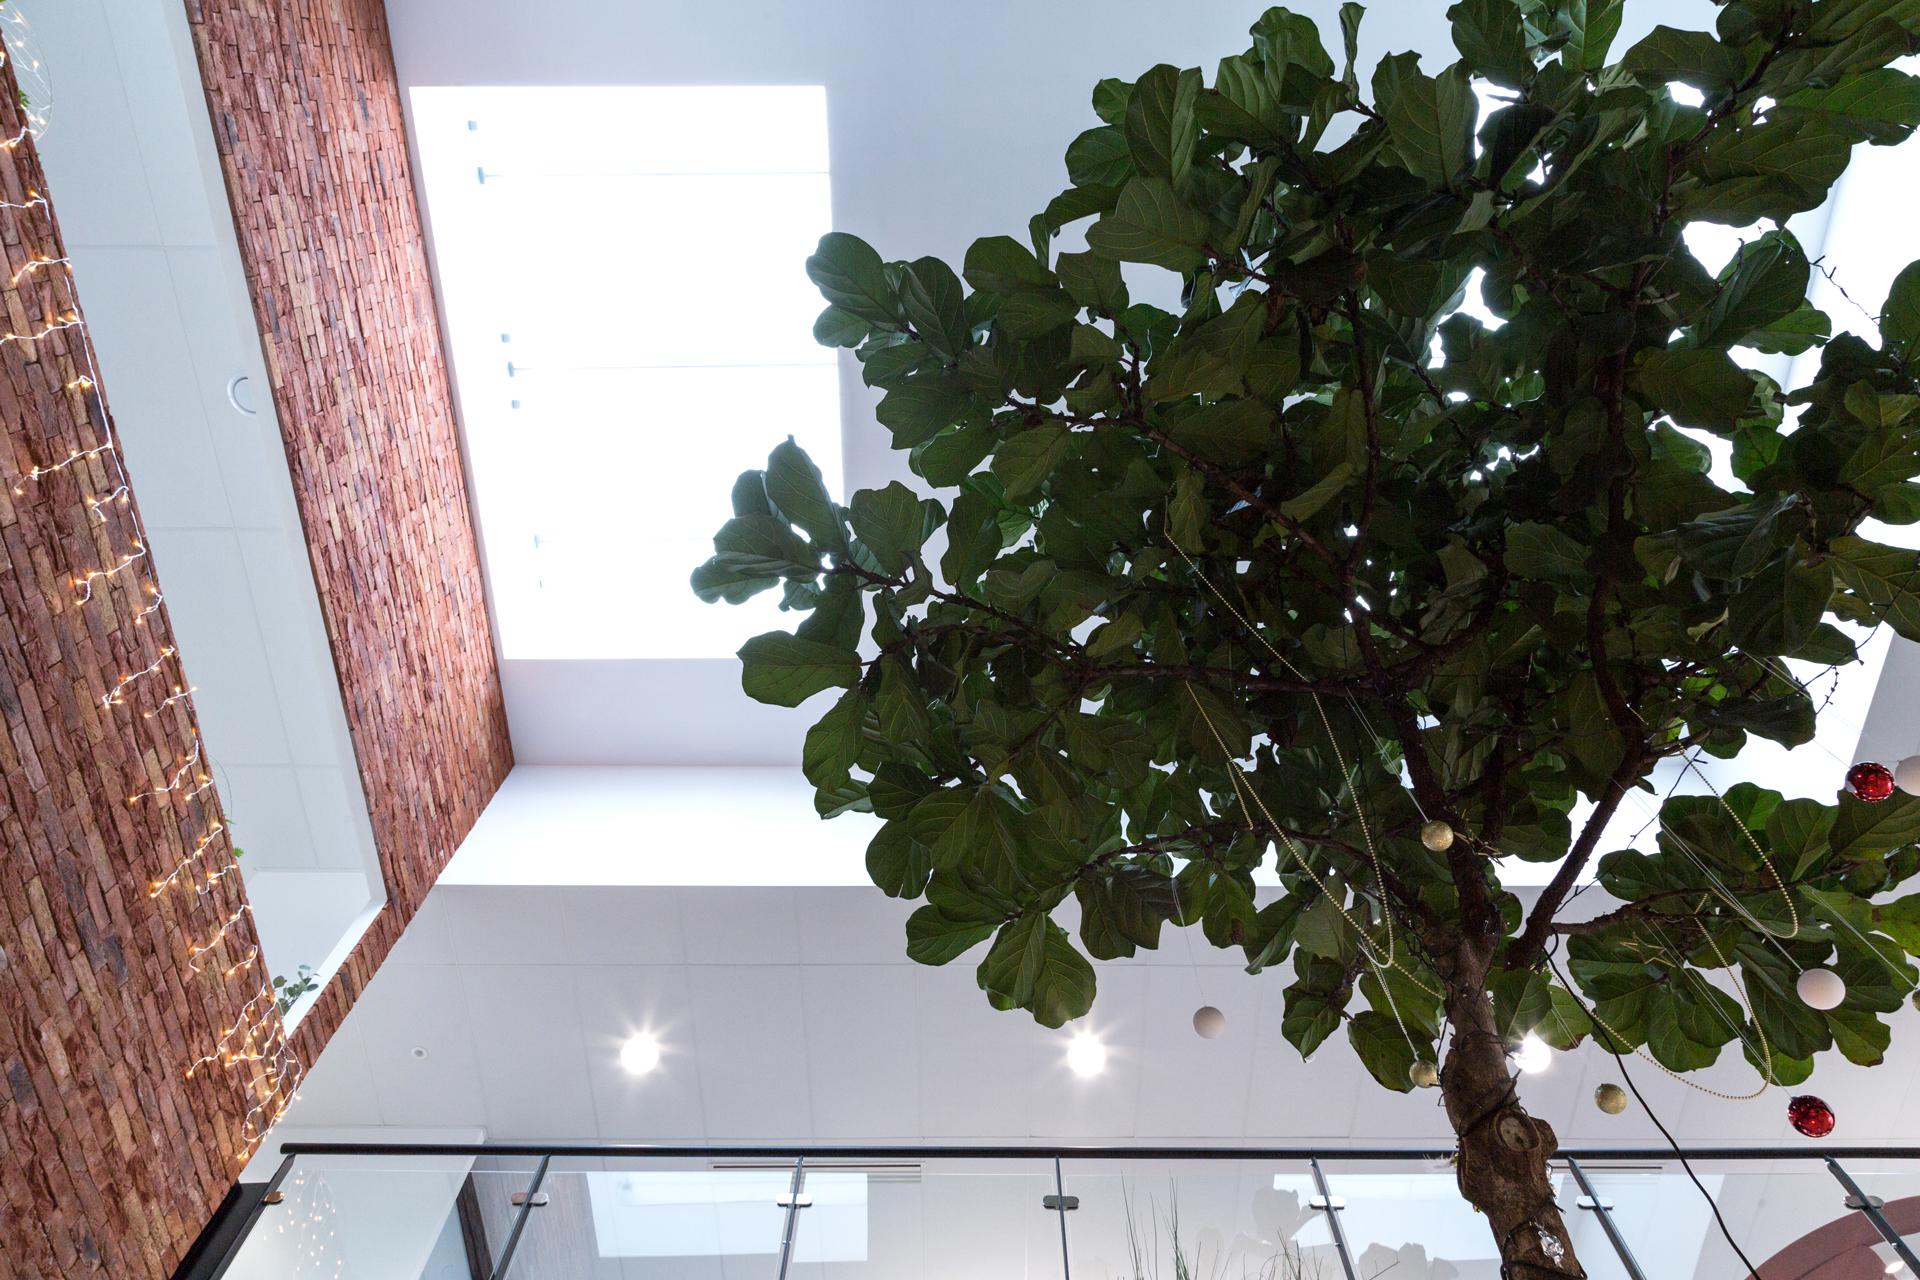 Yanomami-Apsi-table-connectee-vegetale-dessus-lyrata-plongee-verriere